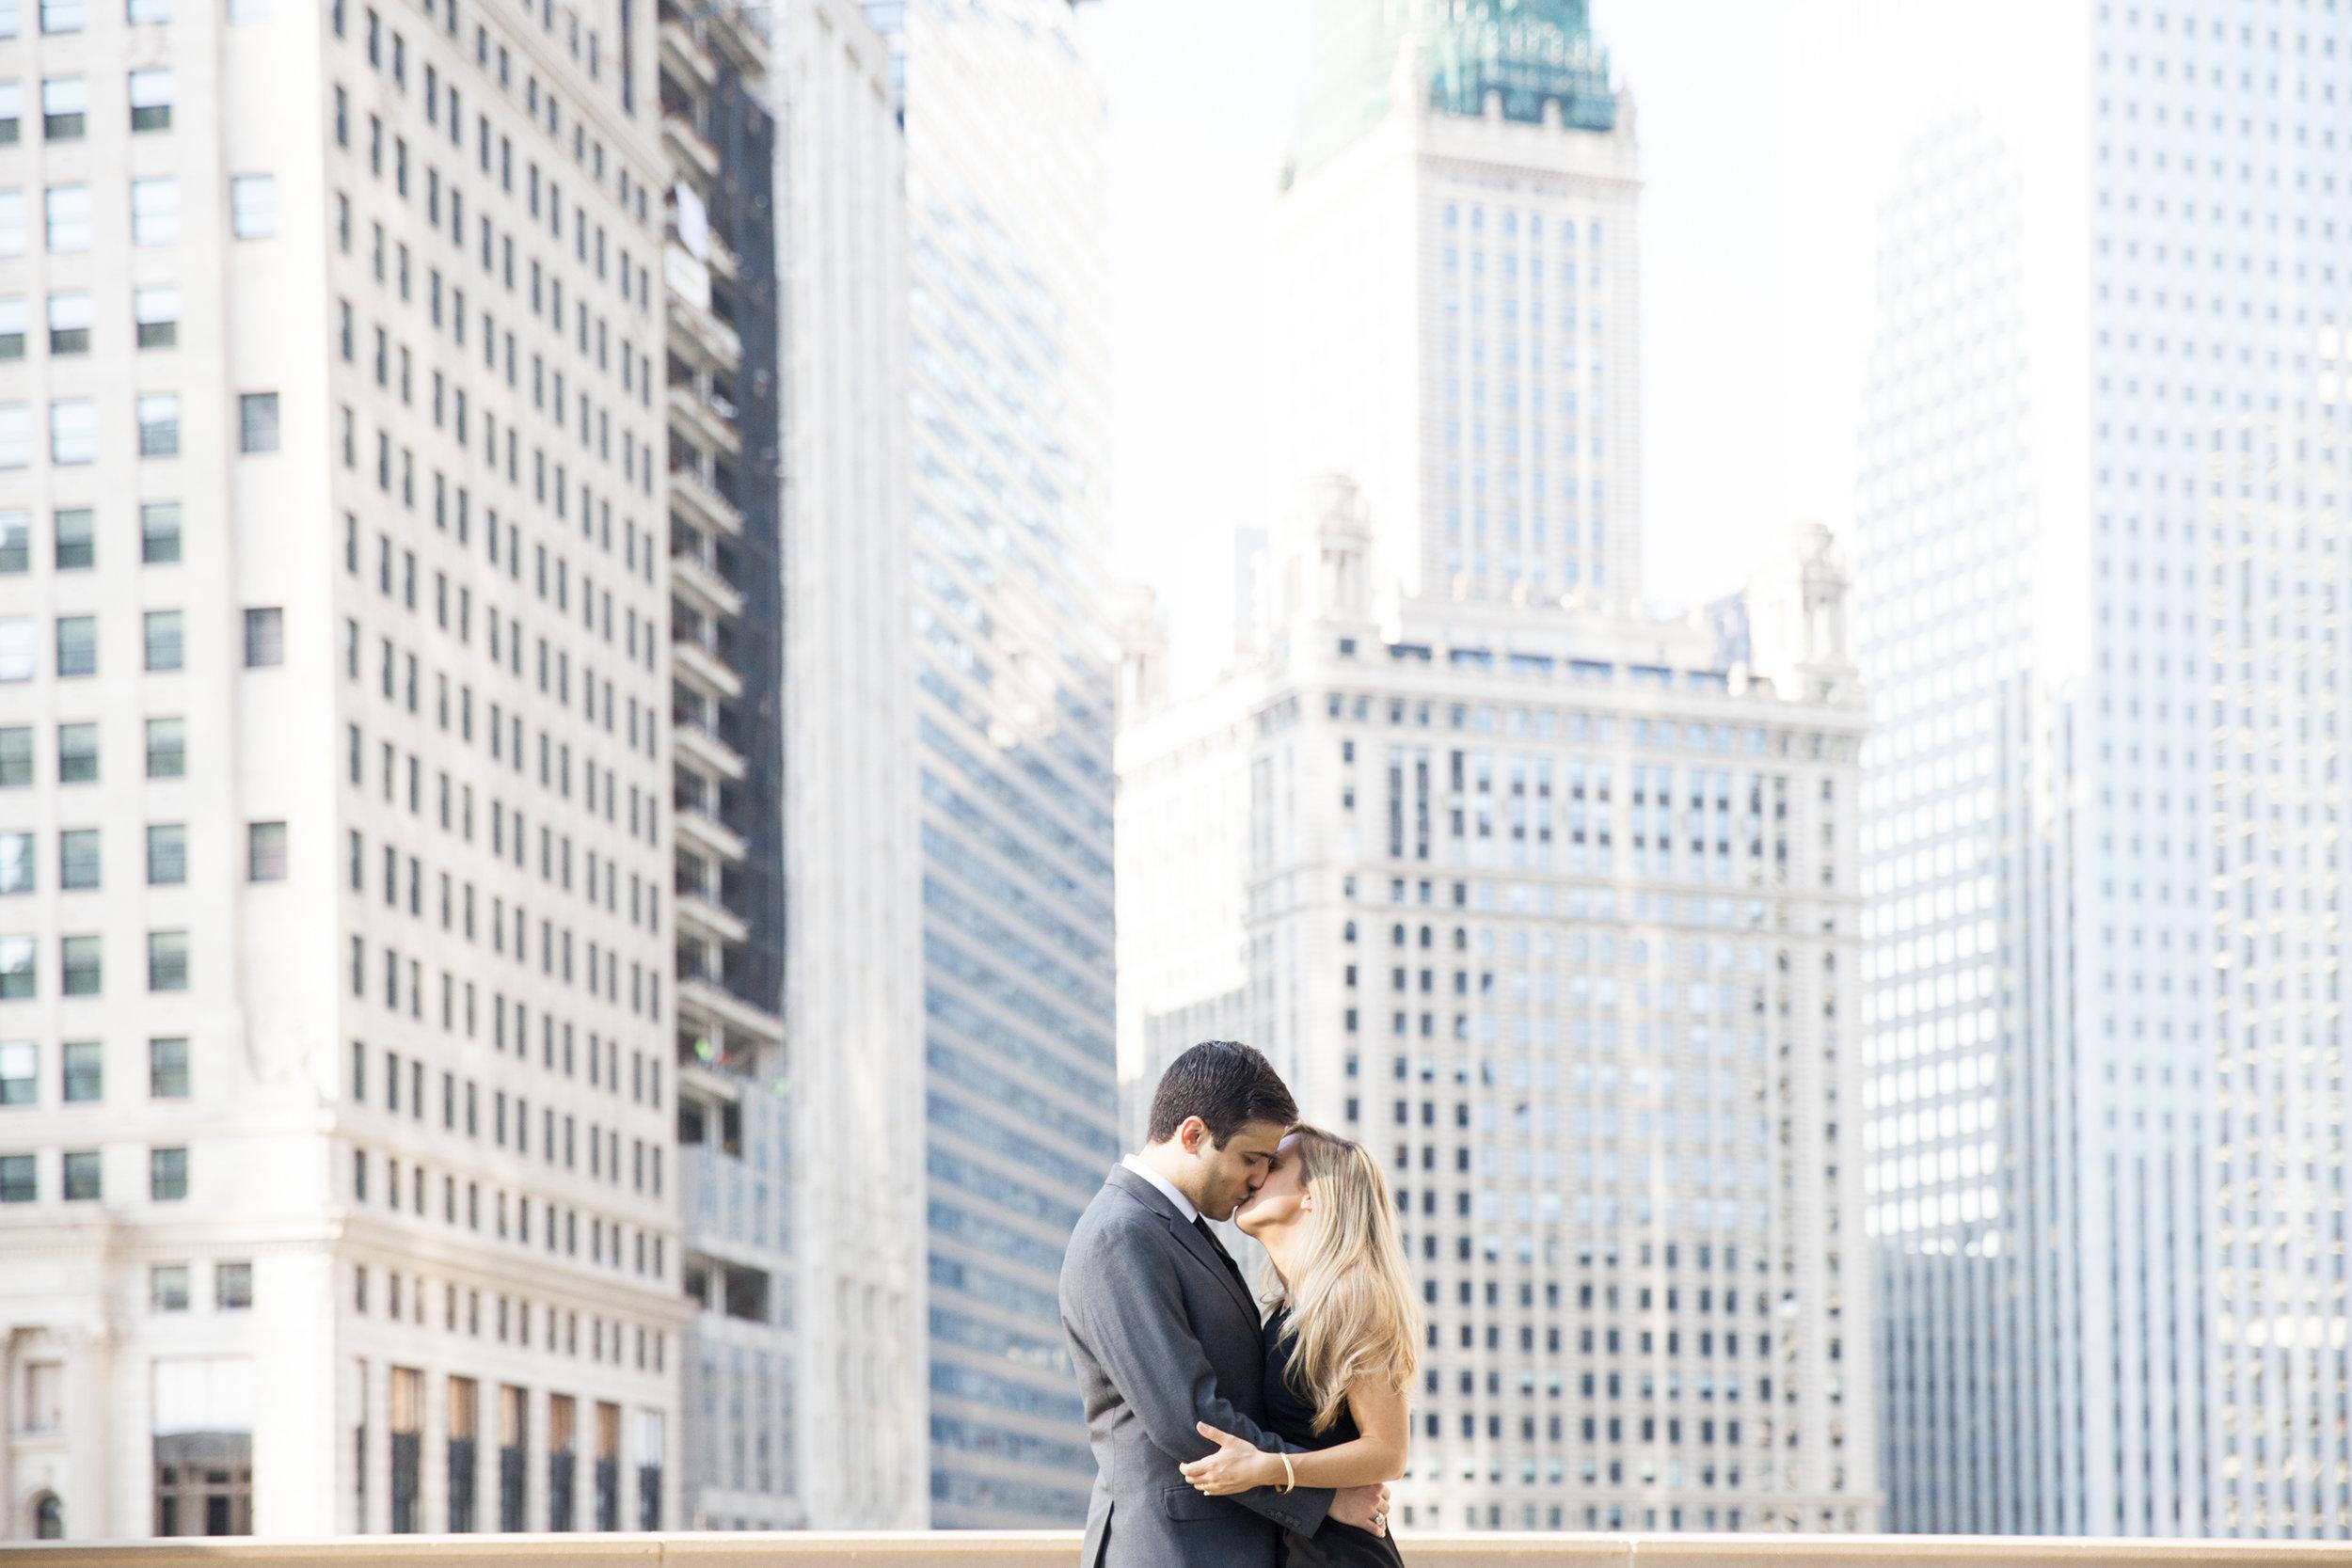 LisaDiederichPhotography_Landon&Ramsey_ChicagoEngagement-10.jpg